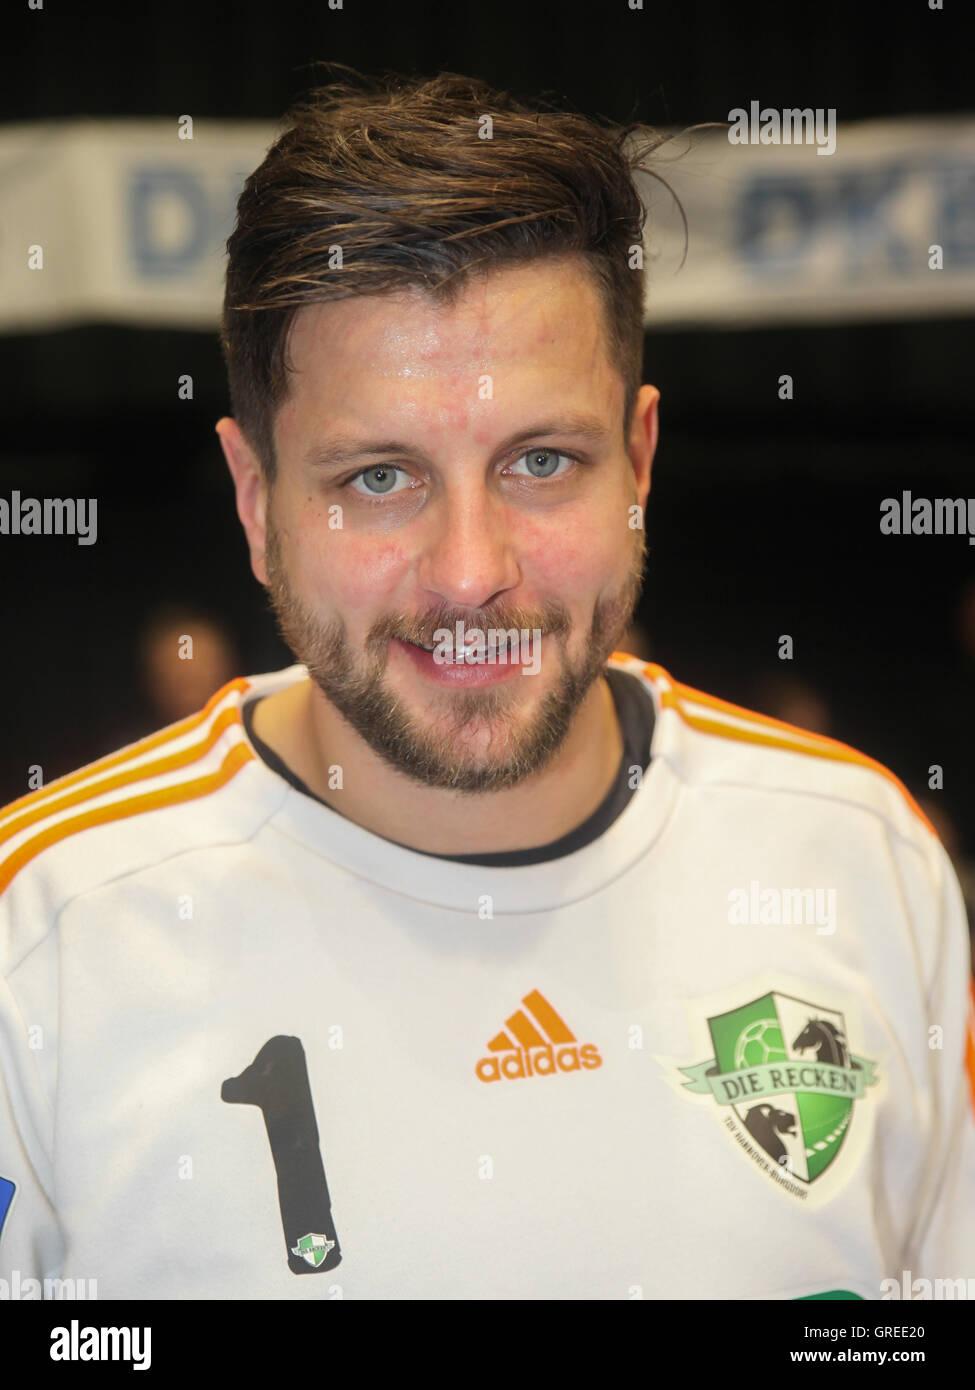 Goalkeeper Martin Ziemer Tsv Hannover Burgdorf - Stock Image